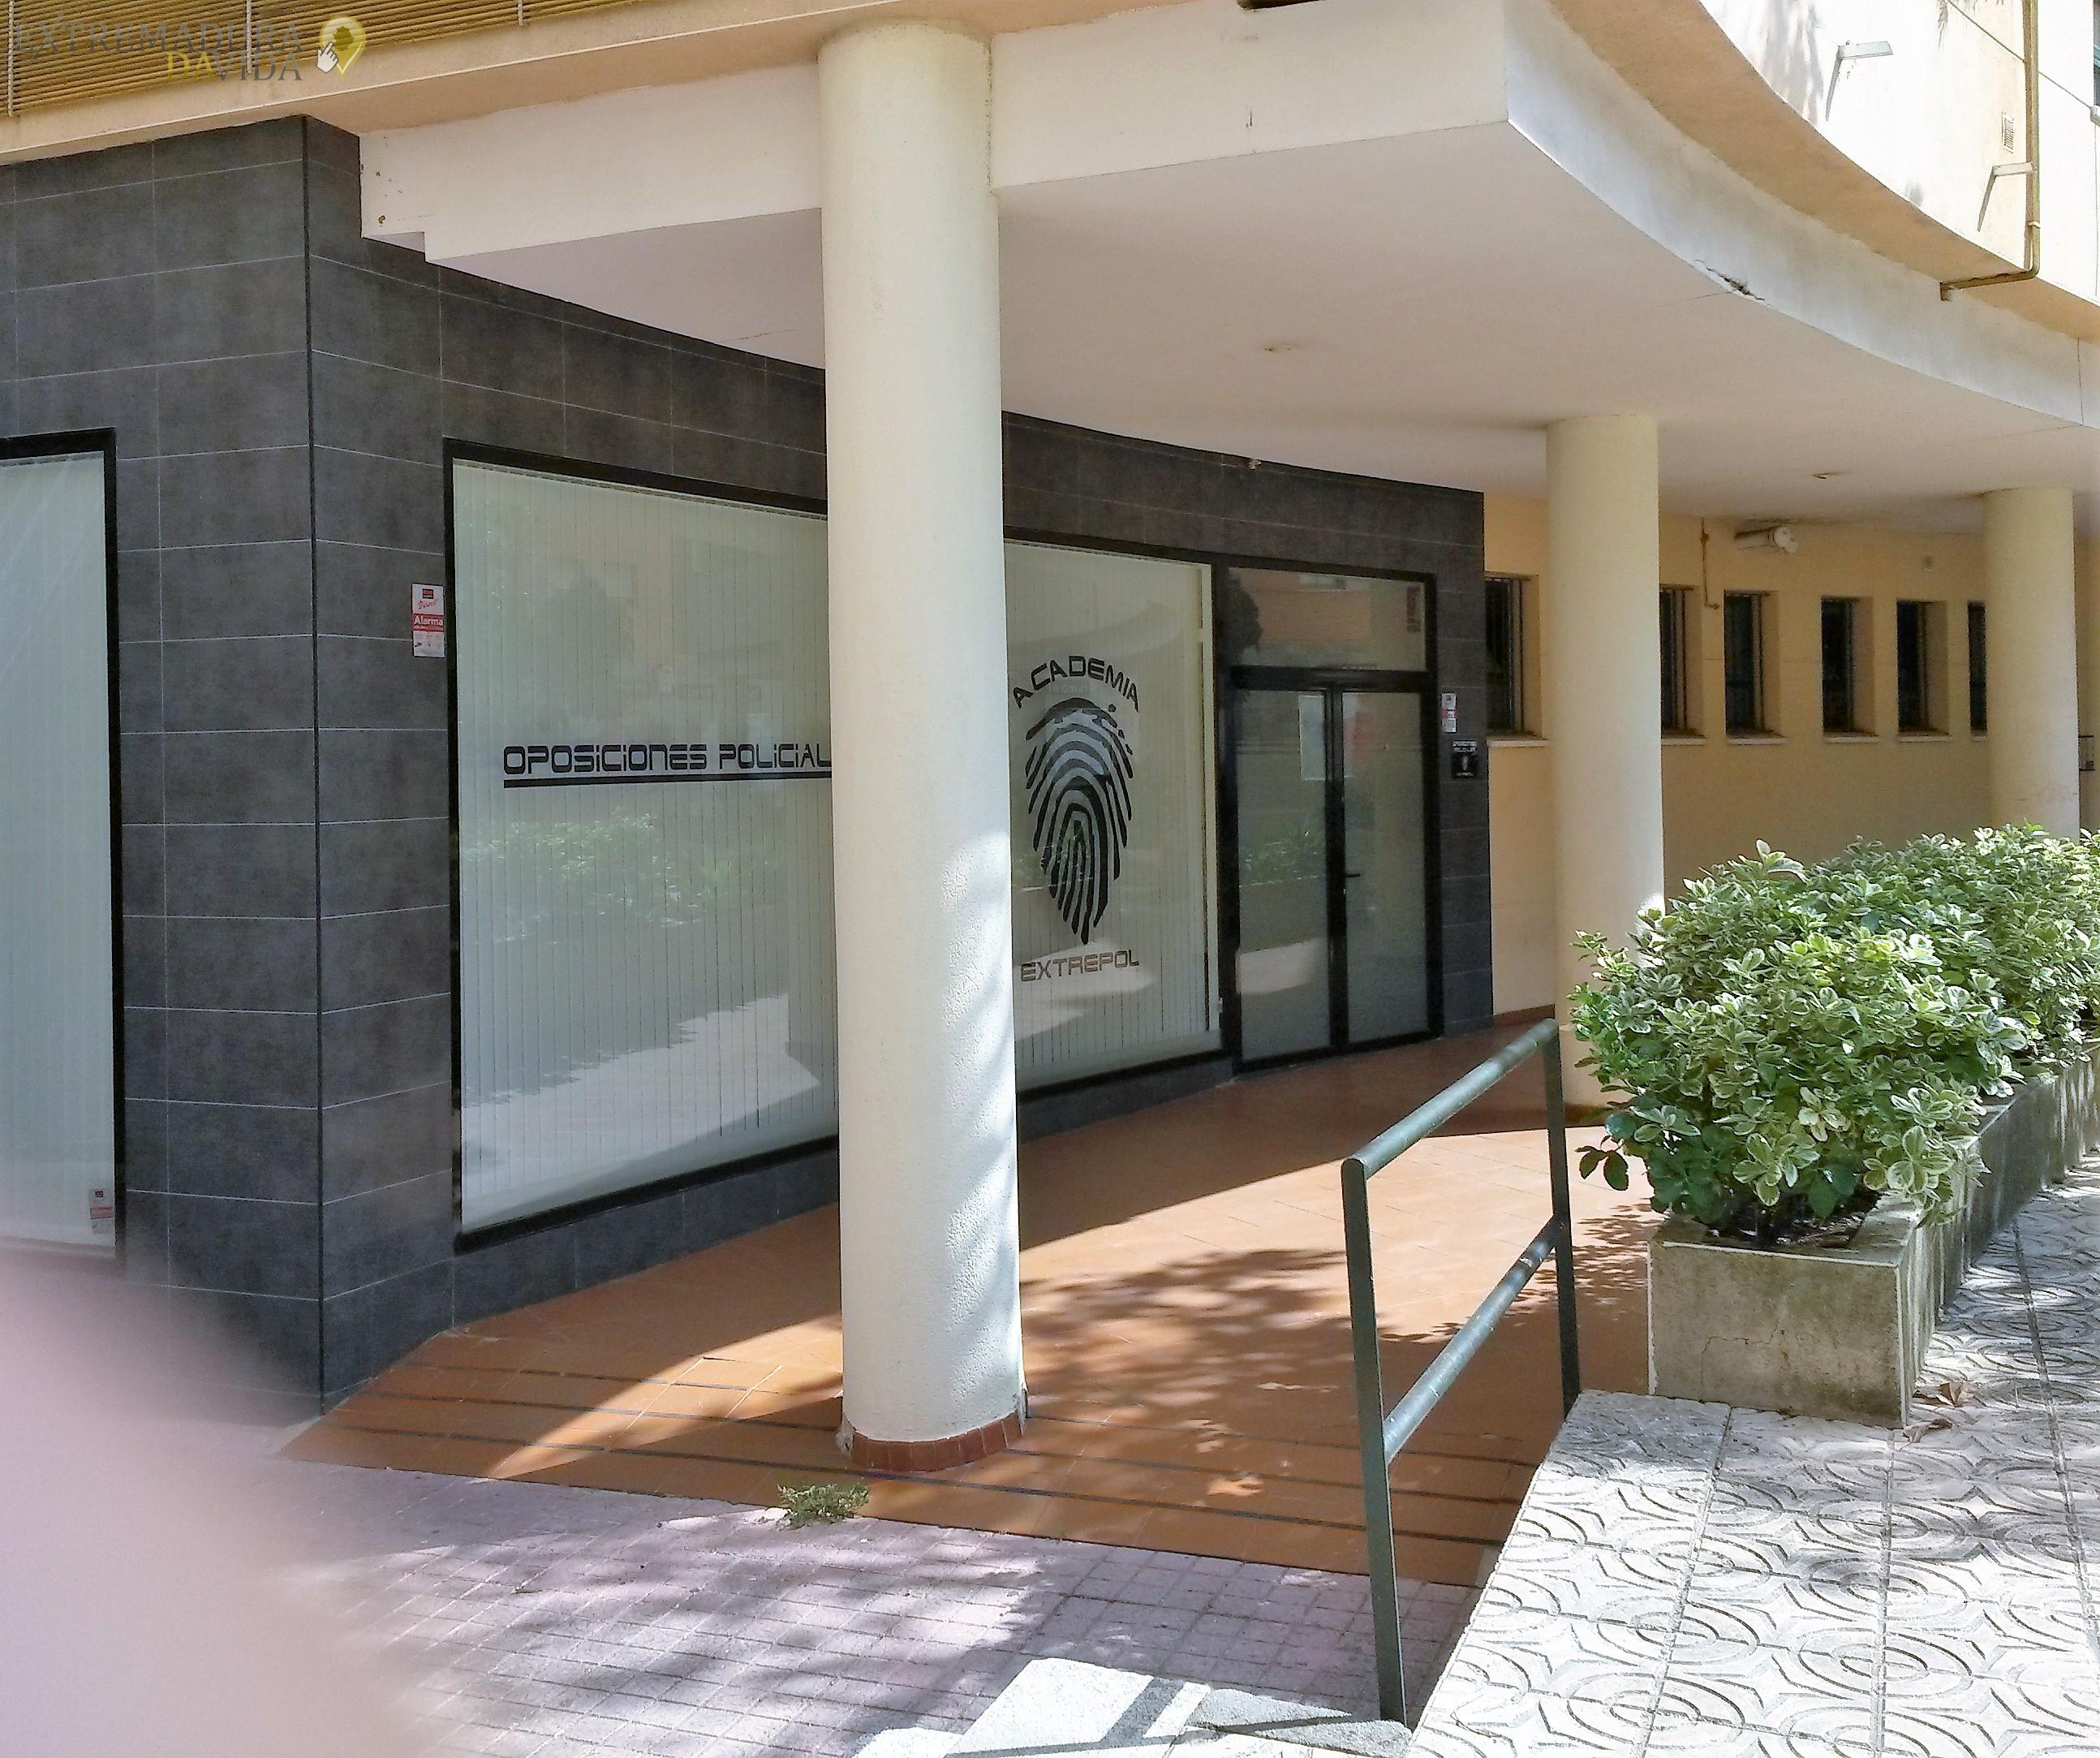 ACADEMIA POLICIA NACIONAL MUNICIPAL OPOSICIONES CACERES EXTREPOL